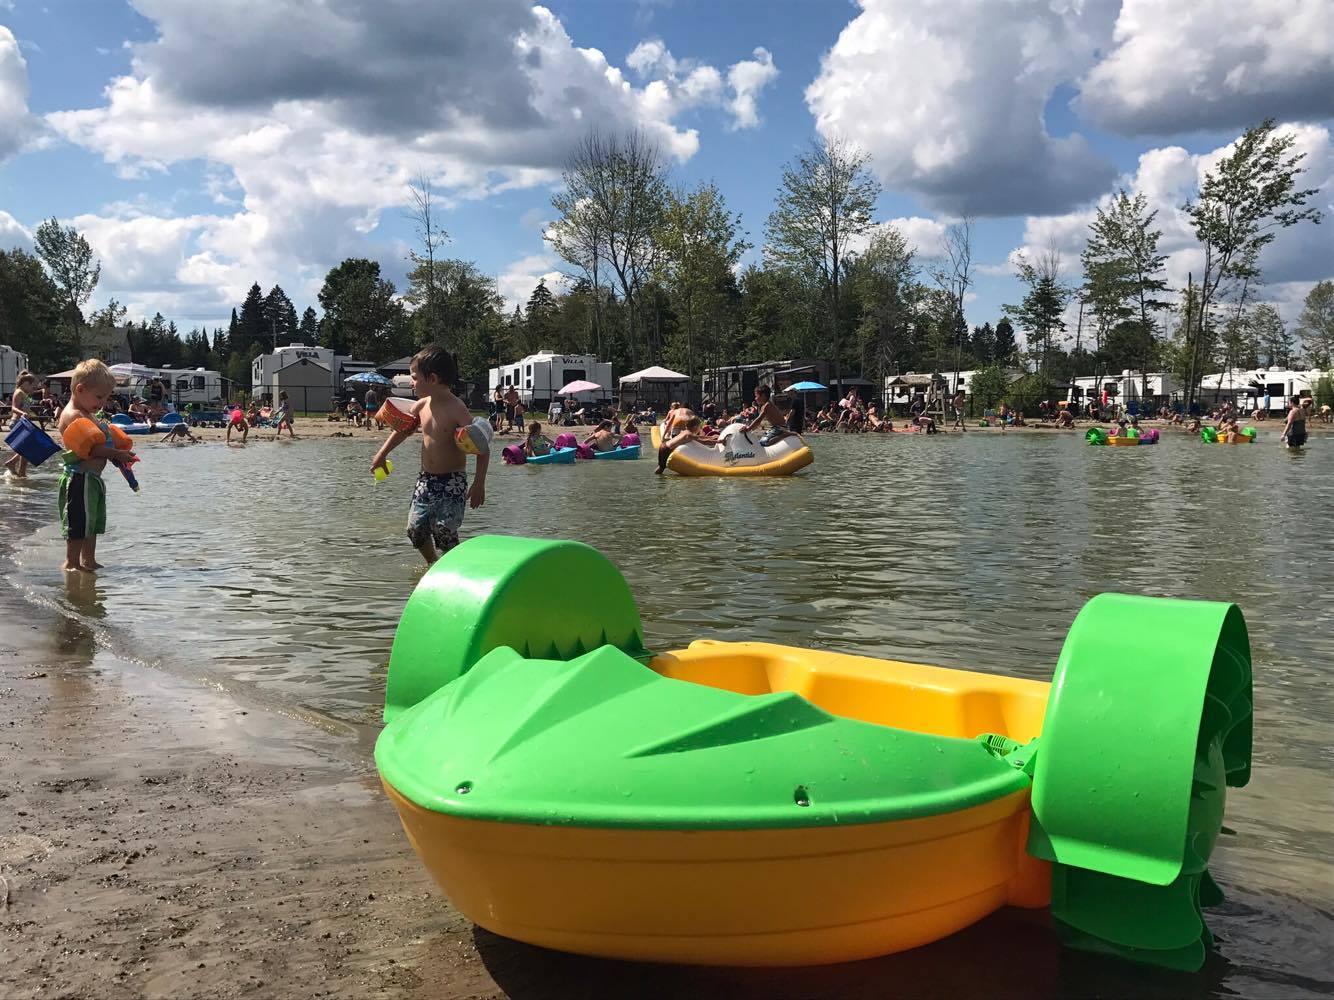 http://www.campingatlantide.com/wp-content/uploads/2018/01/beach-party-2017-complexe-atlantide-10.jpg